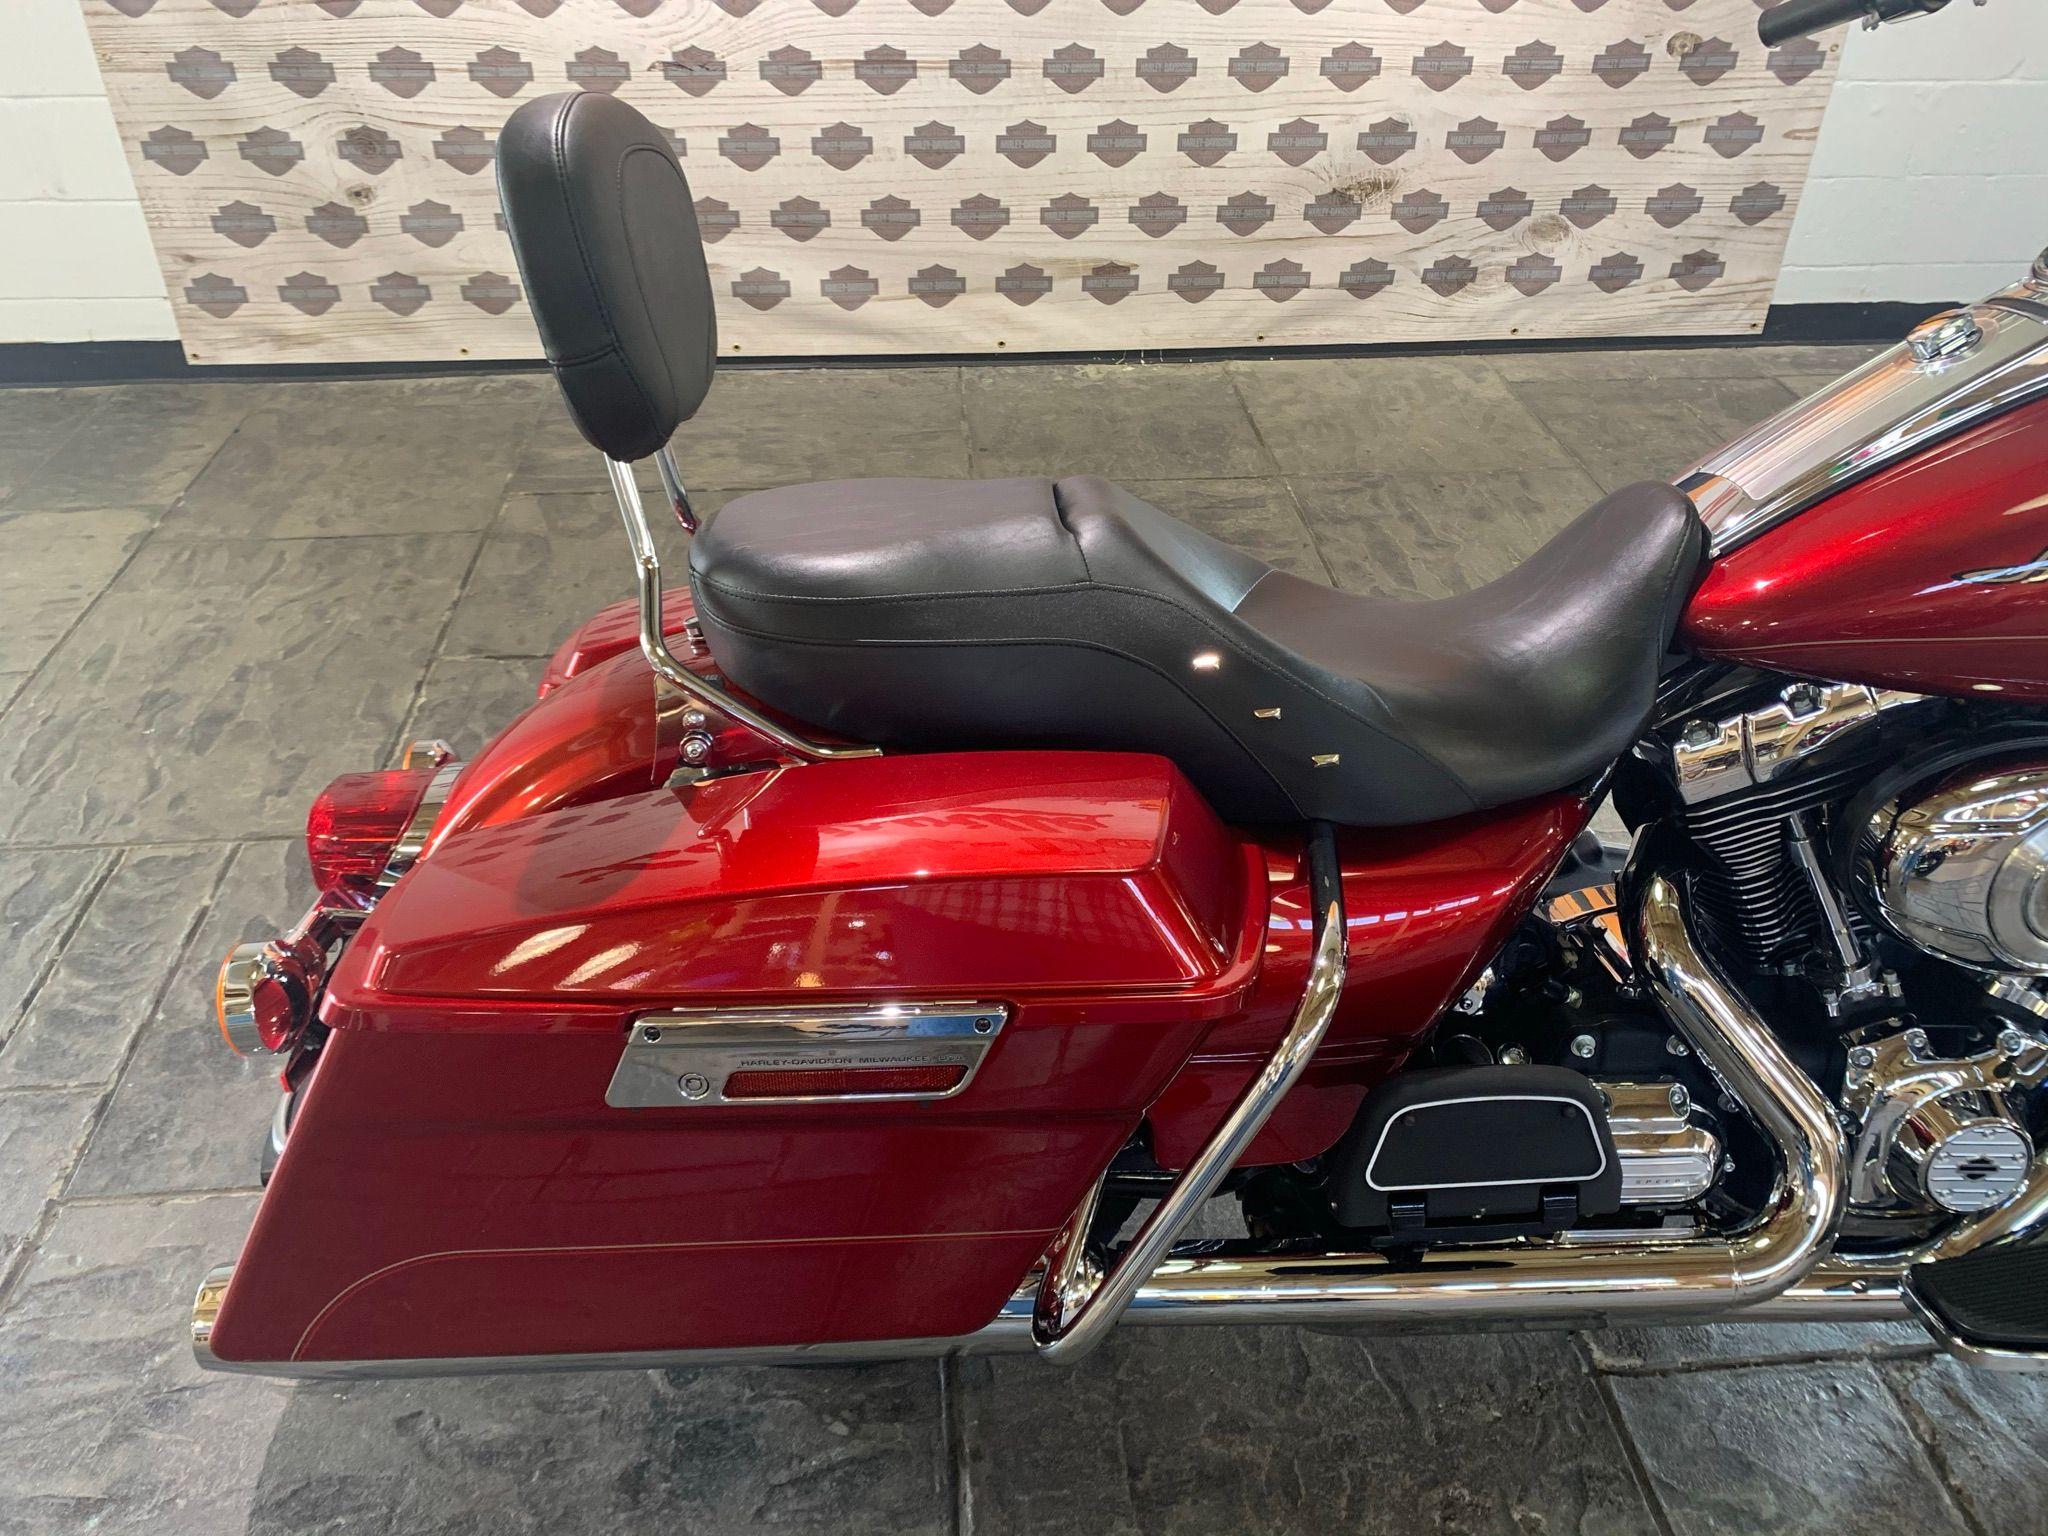 Pre-Owned 2013 Harley-Davidson Road King